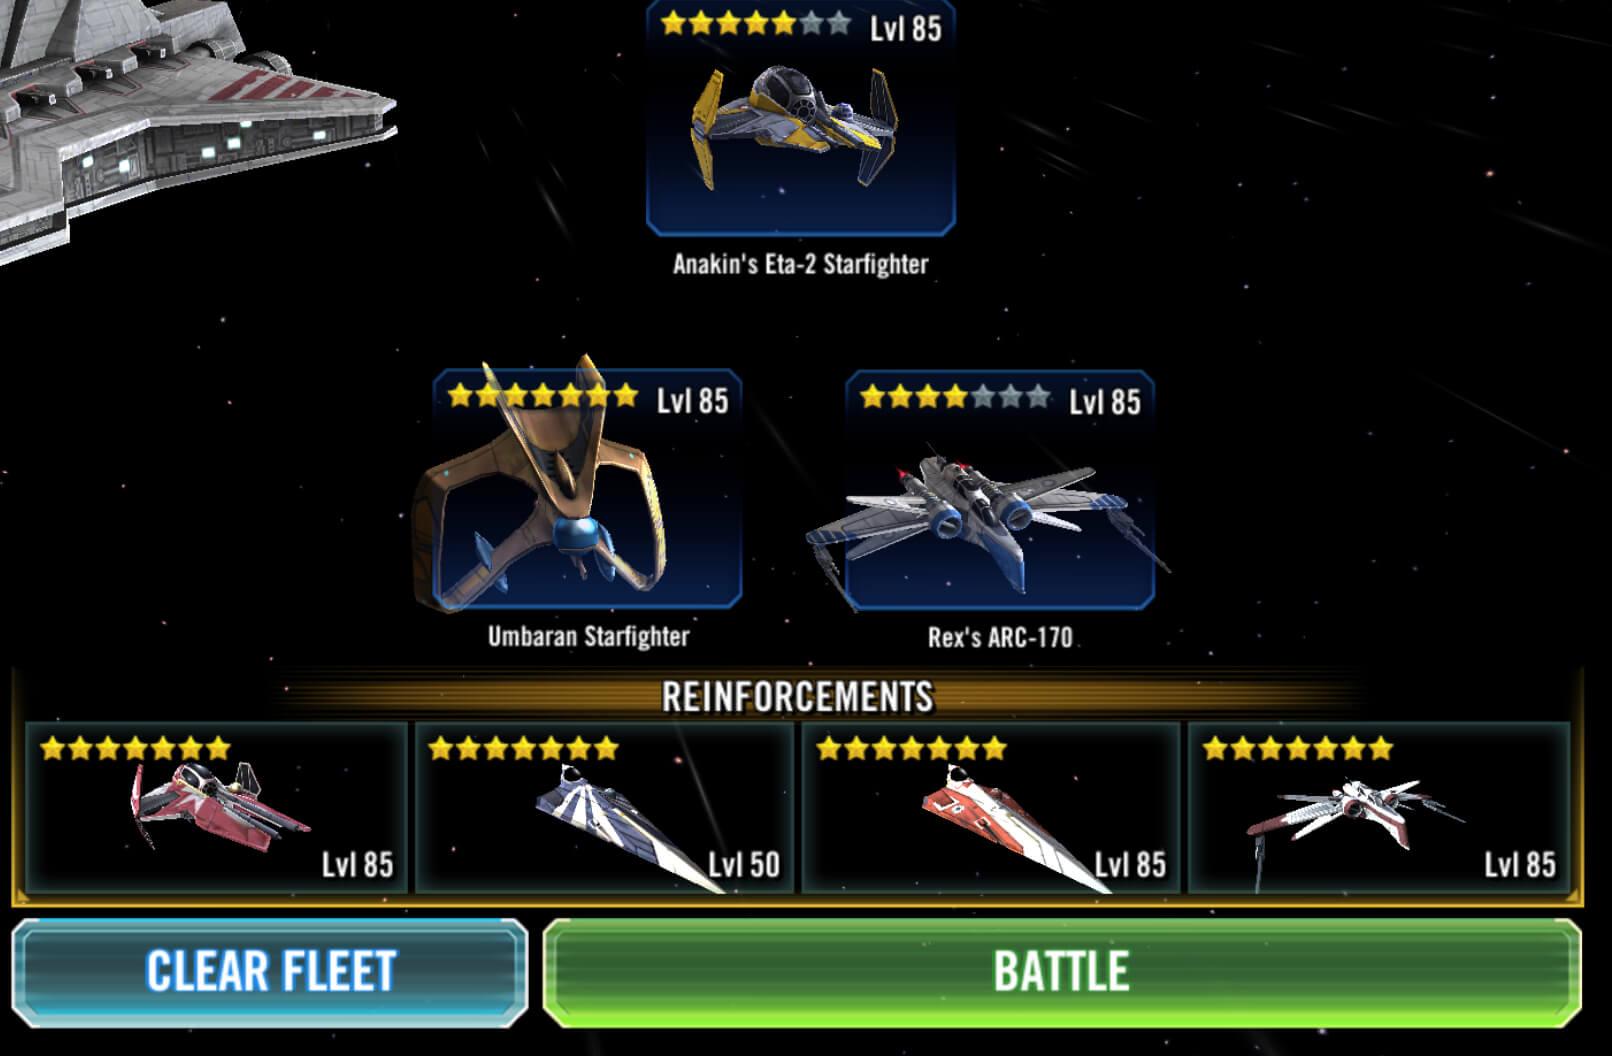 General Skywalker Guide | GamePress